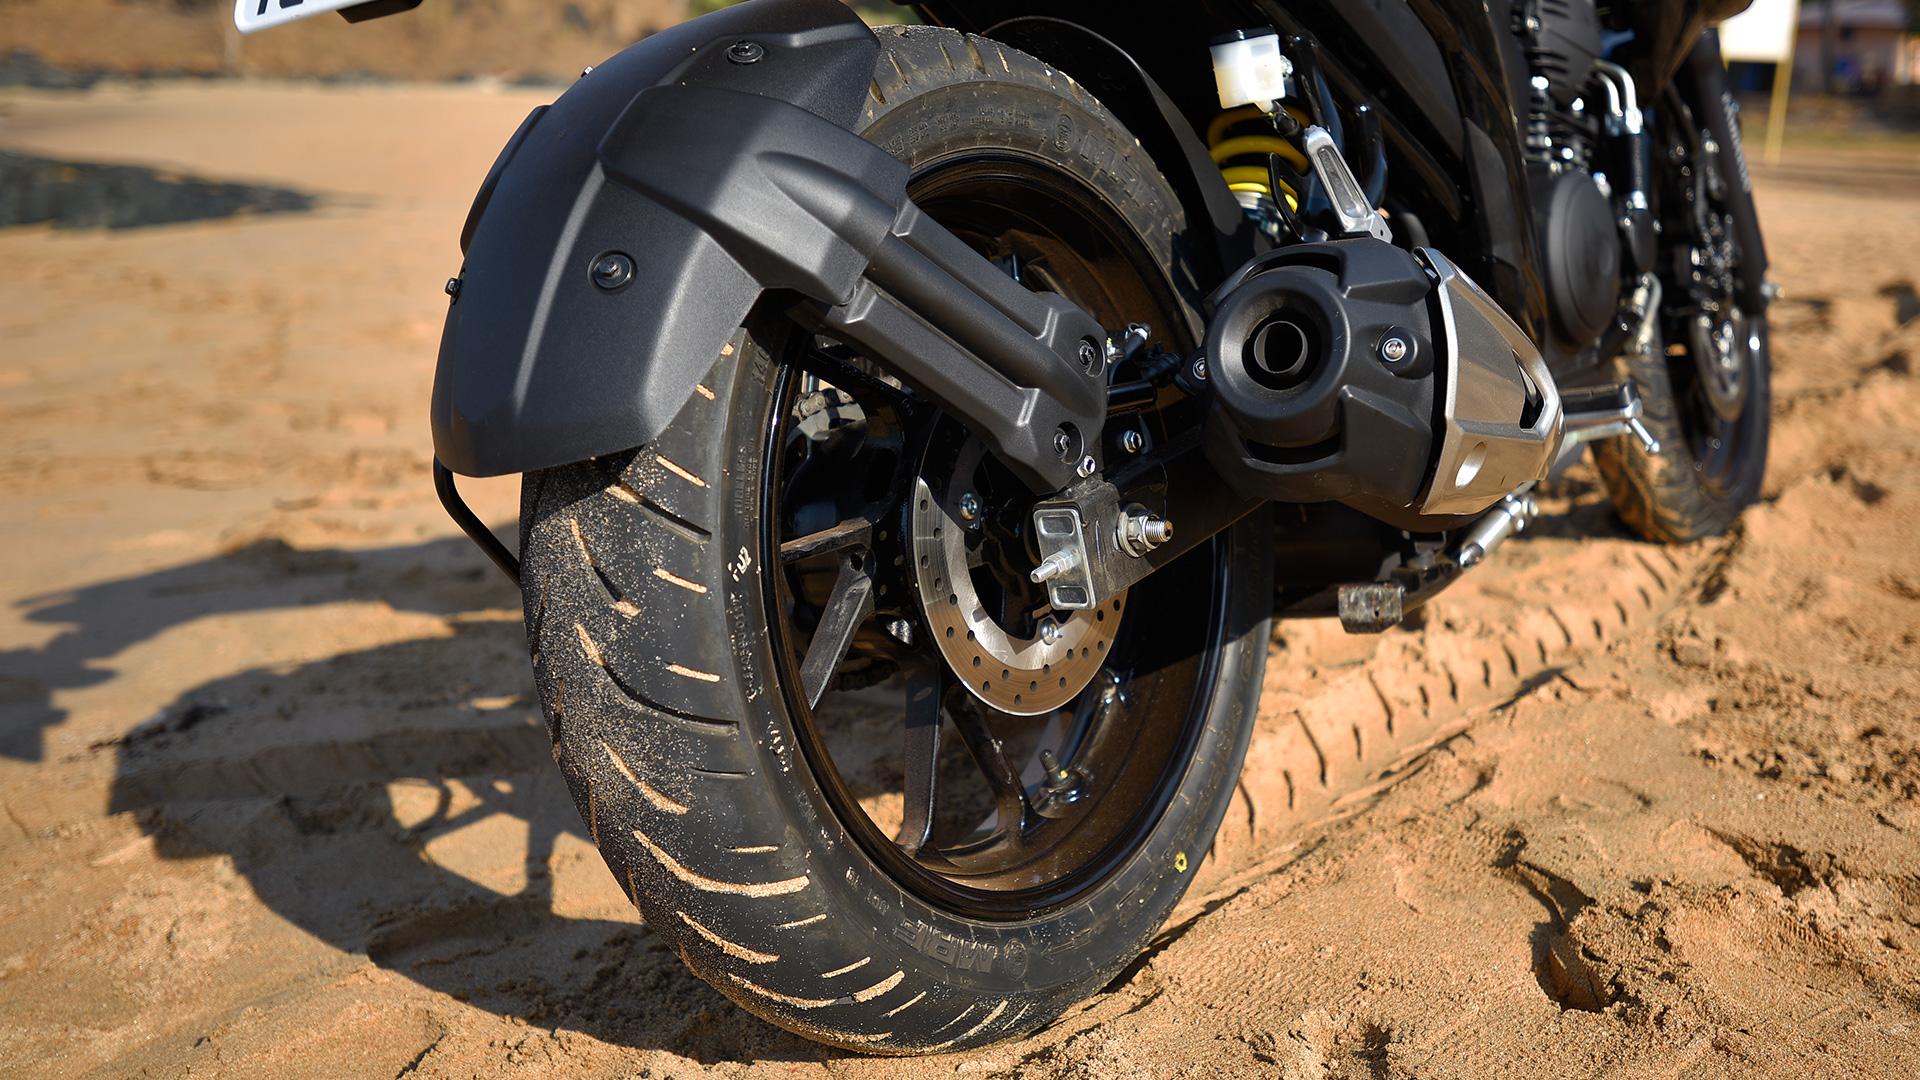 Yamaha Fz 2017 25 Price Mileage Reviews Specification